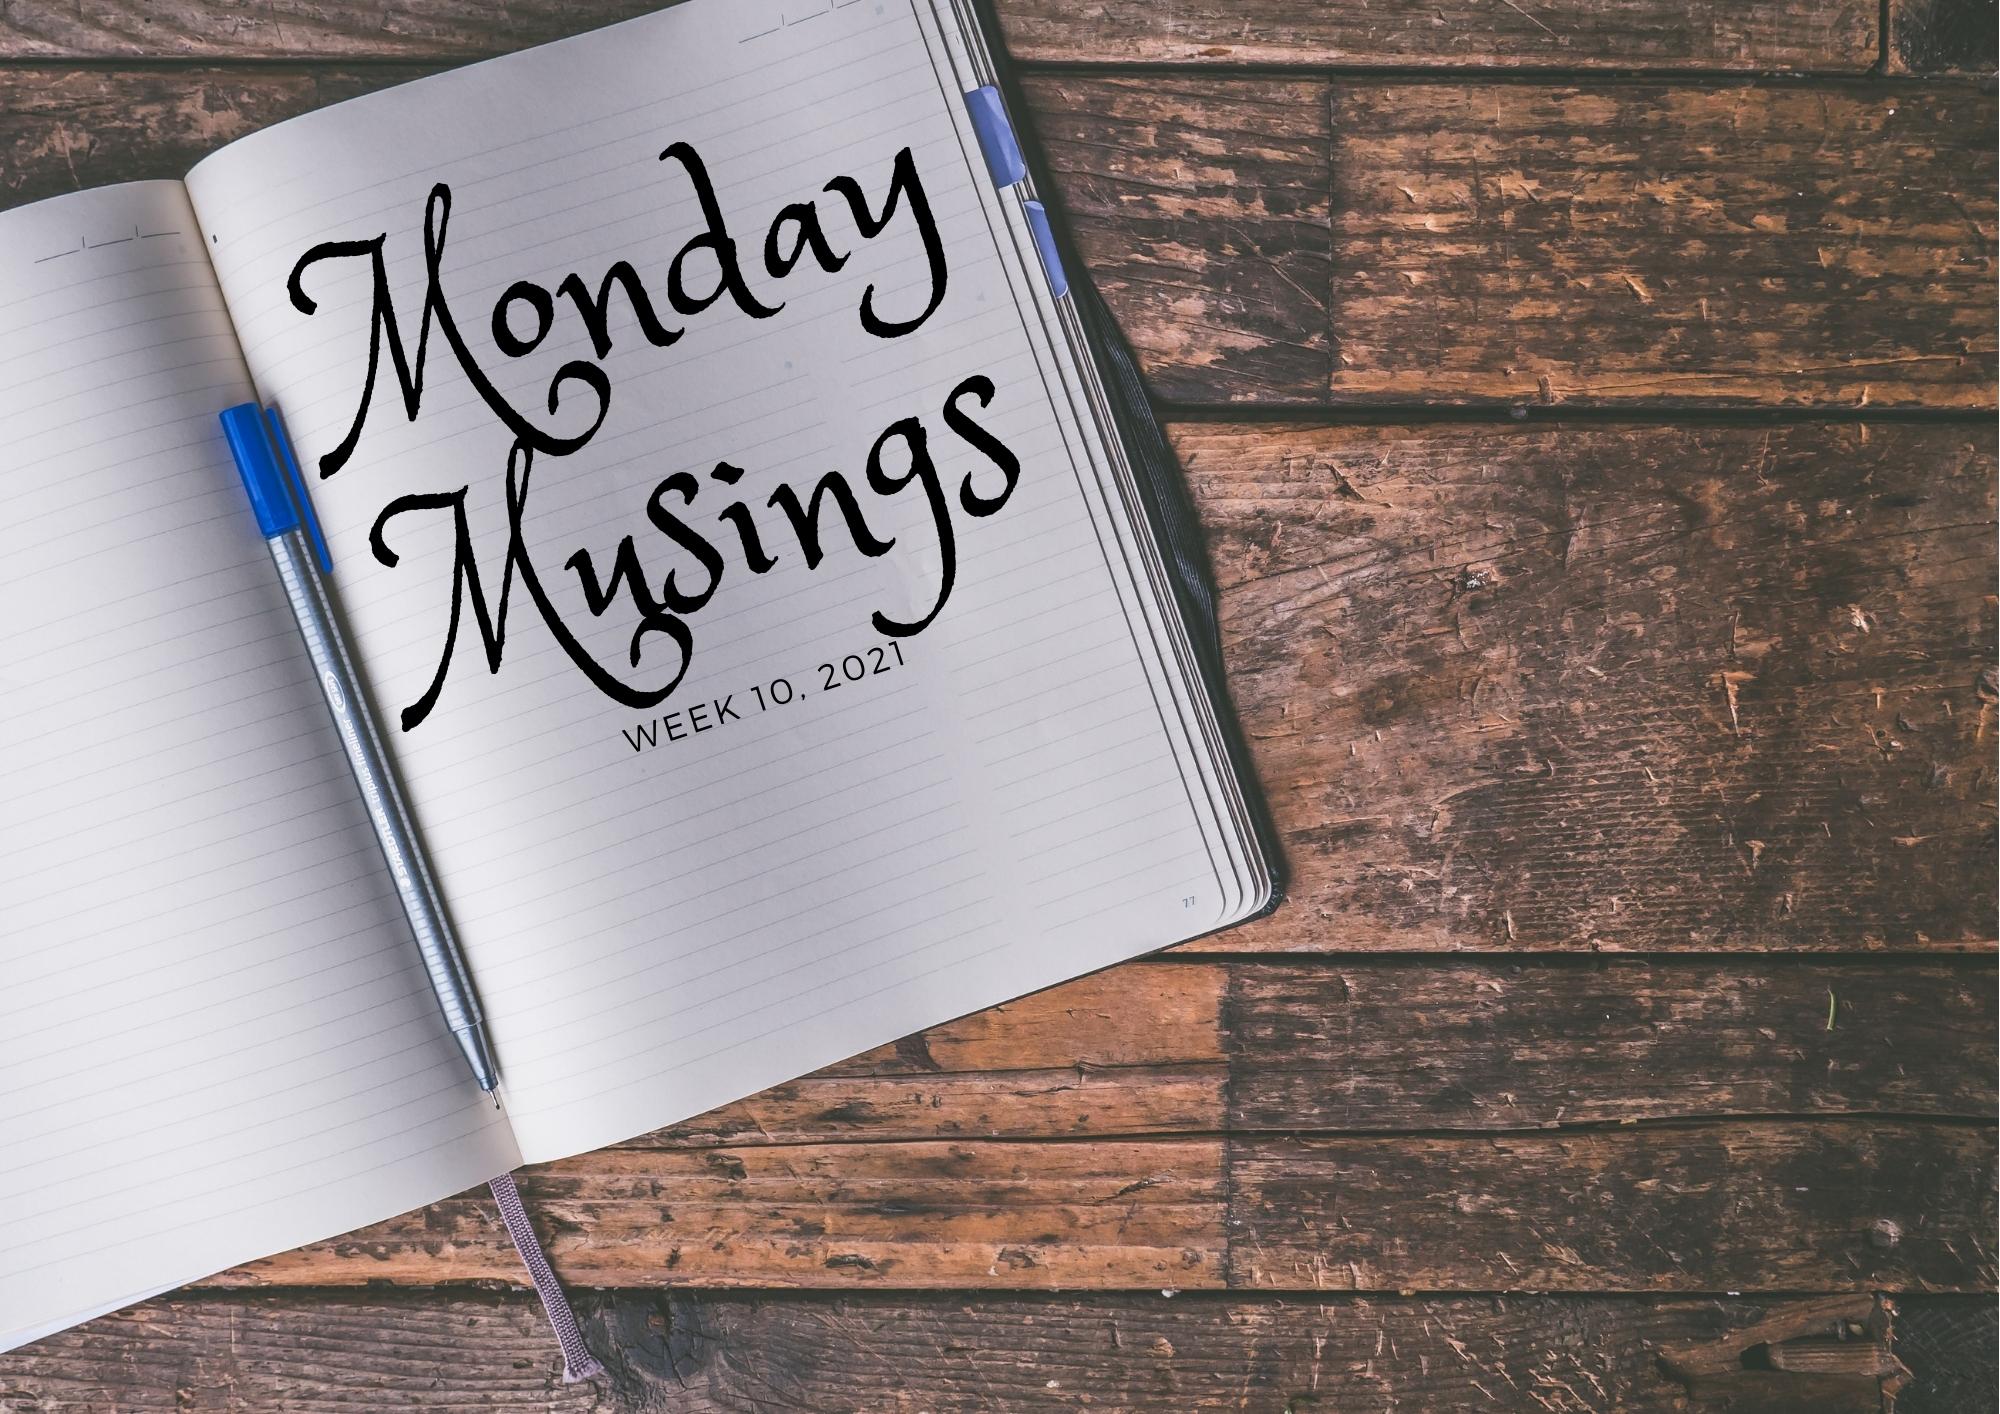 Monday Musings 10